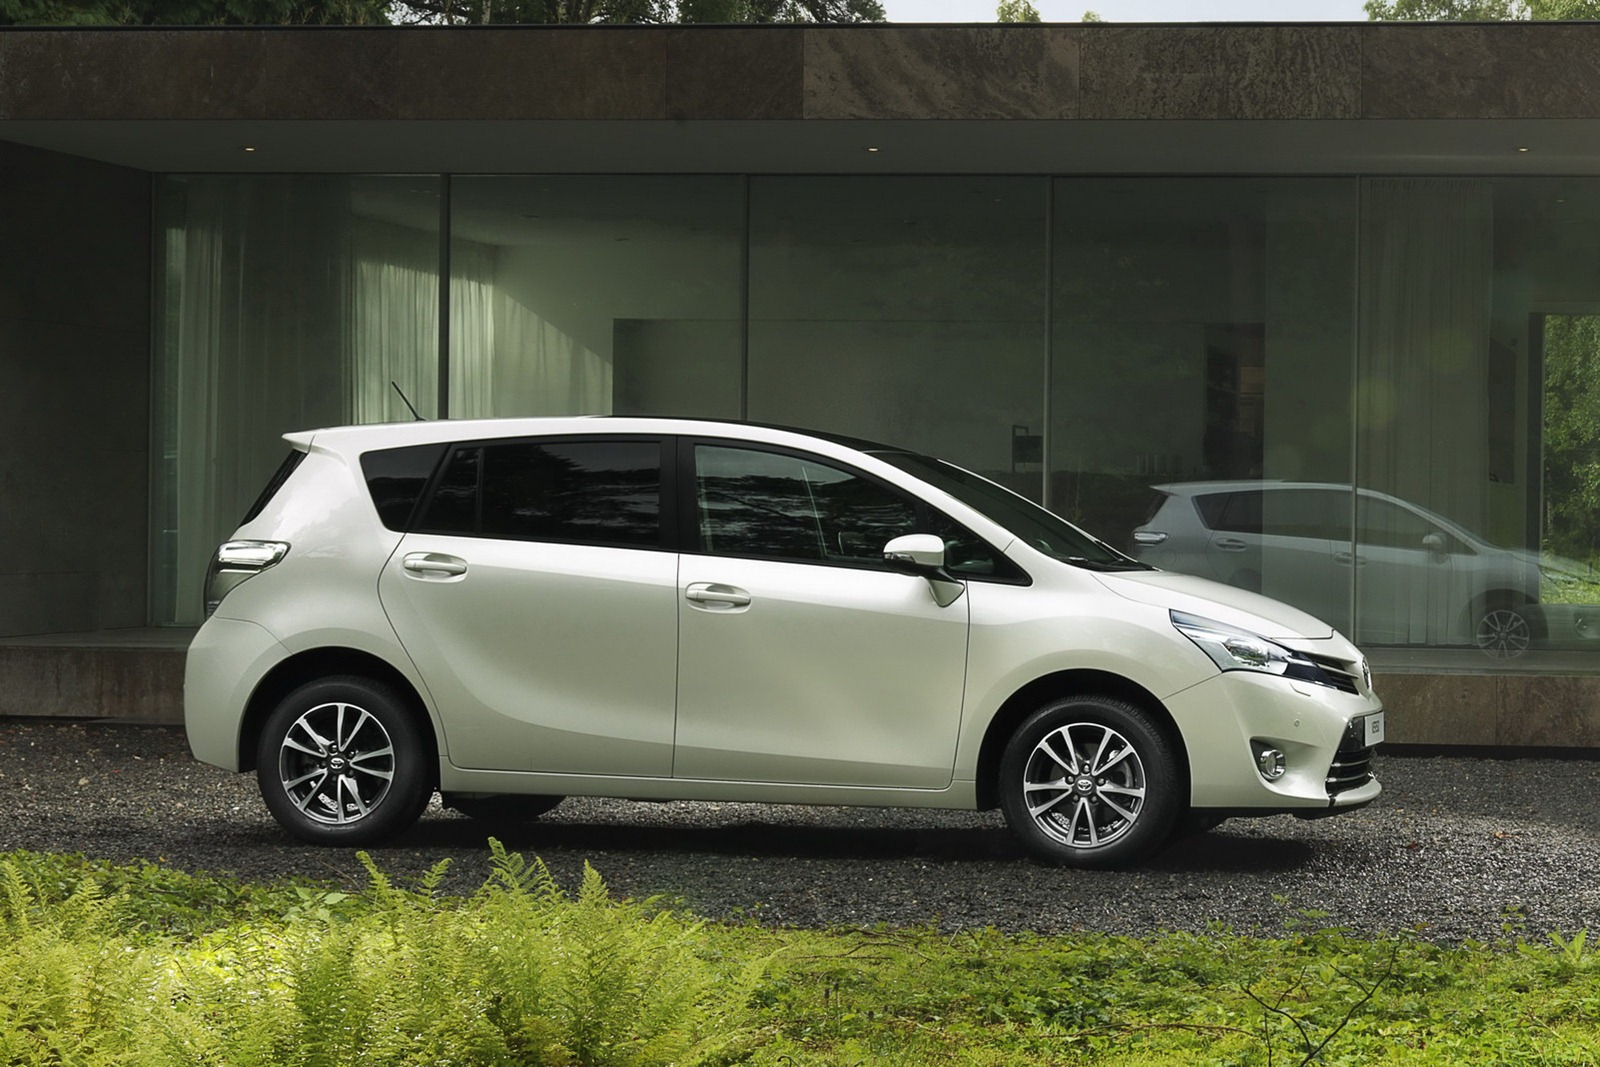 2013 Toyota Verso MPV Gets a Facelift - autoevolution